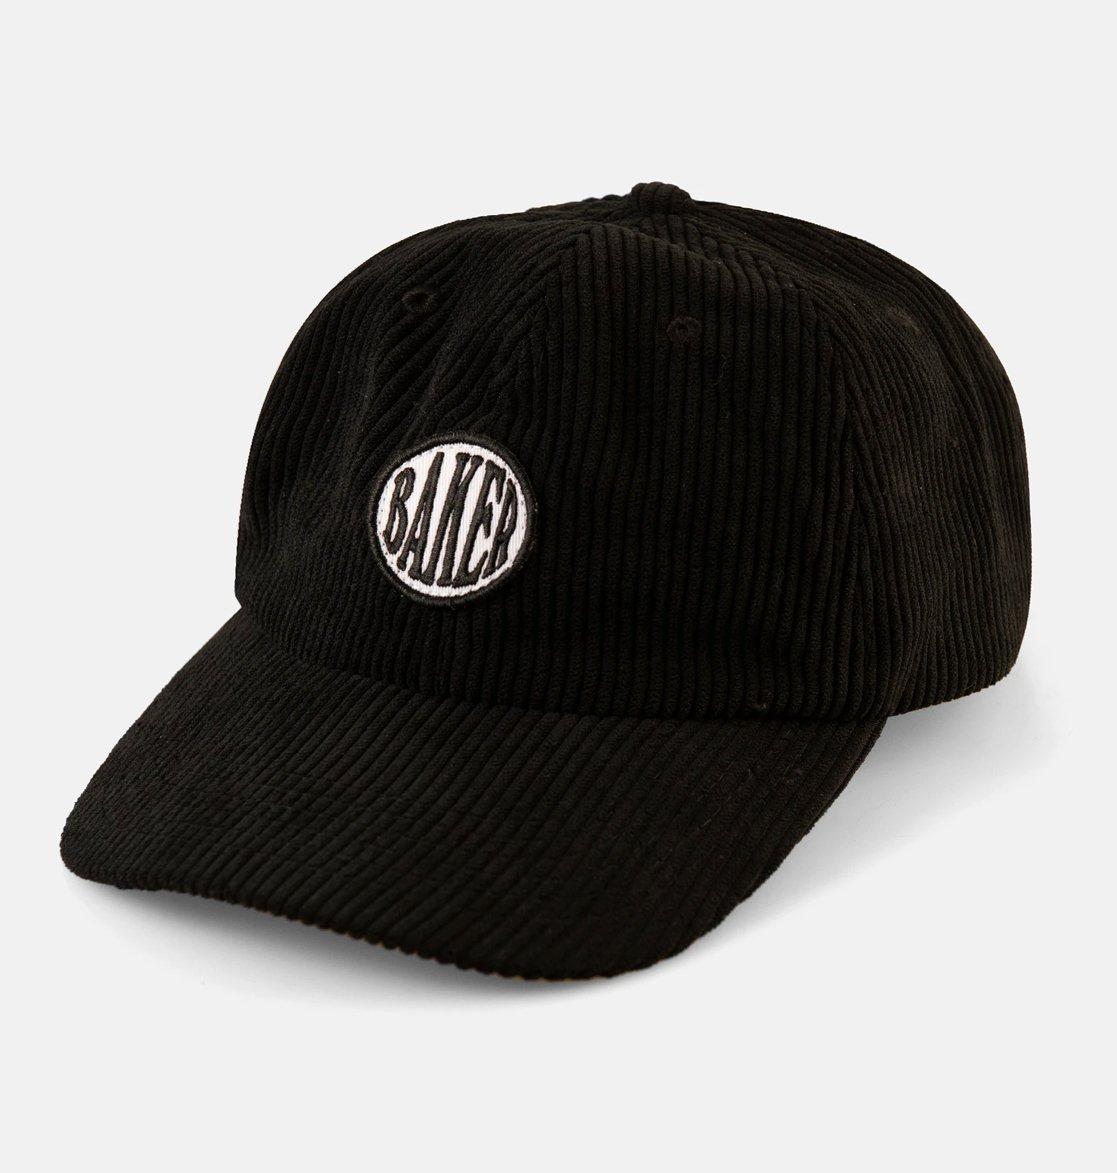 Baker Nautical Cord Snapback Hat